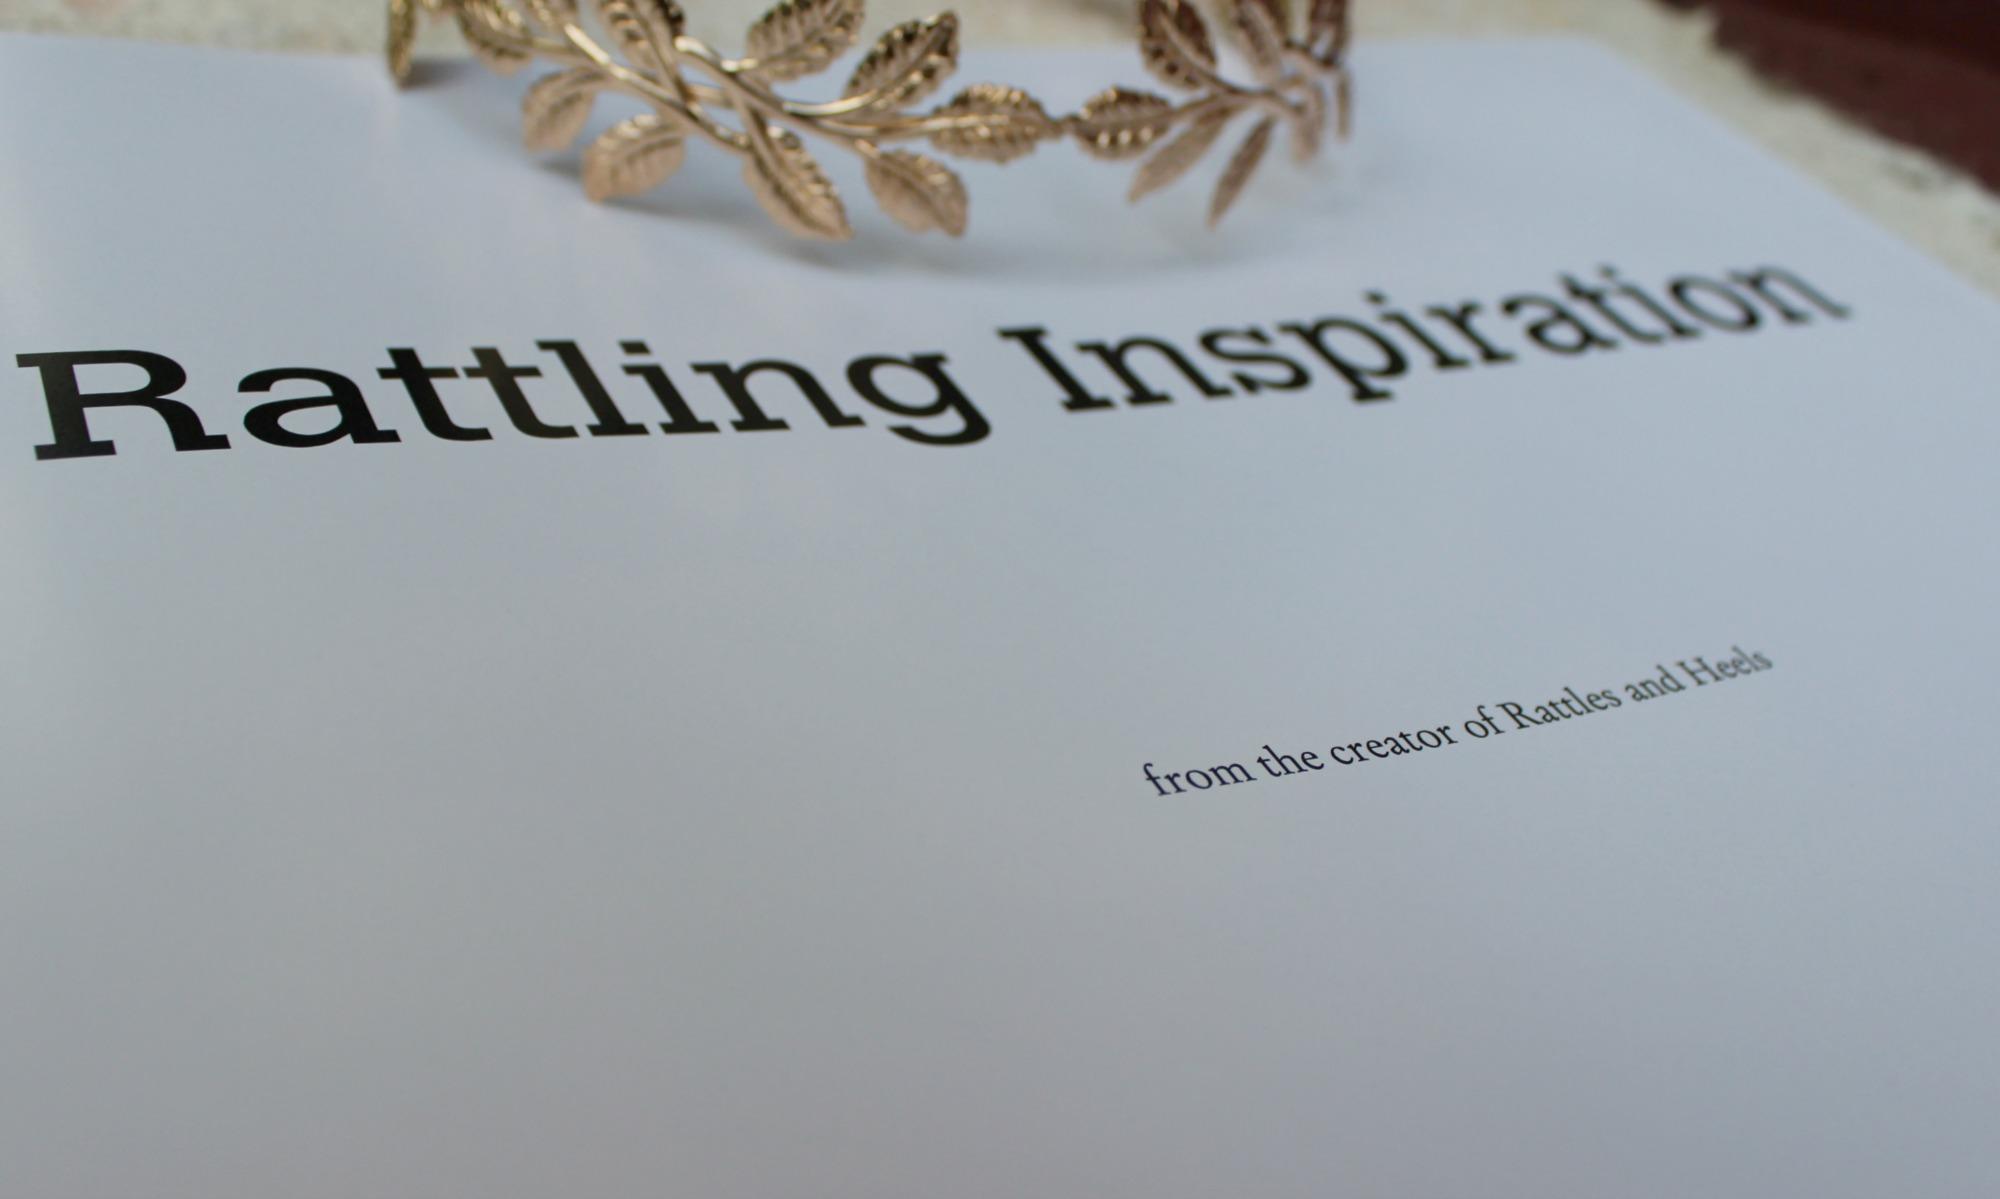 Rattling Inspiration